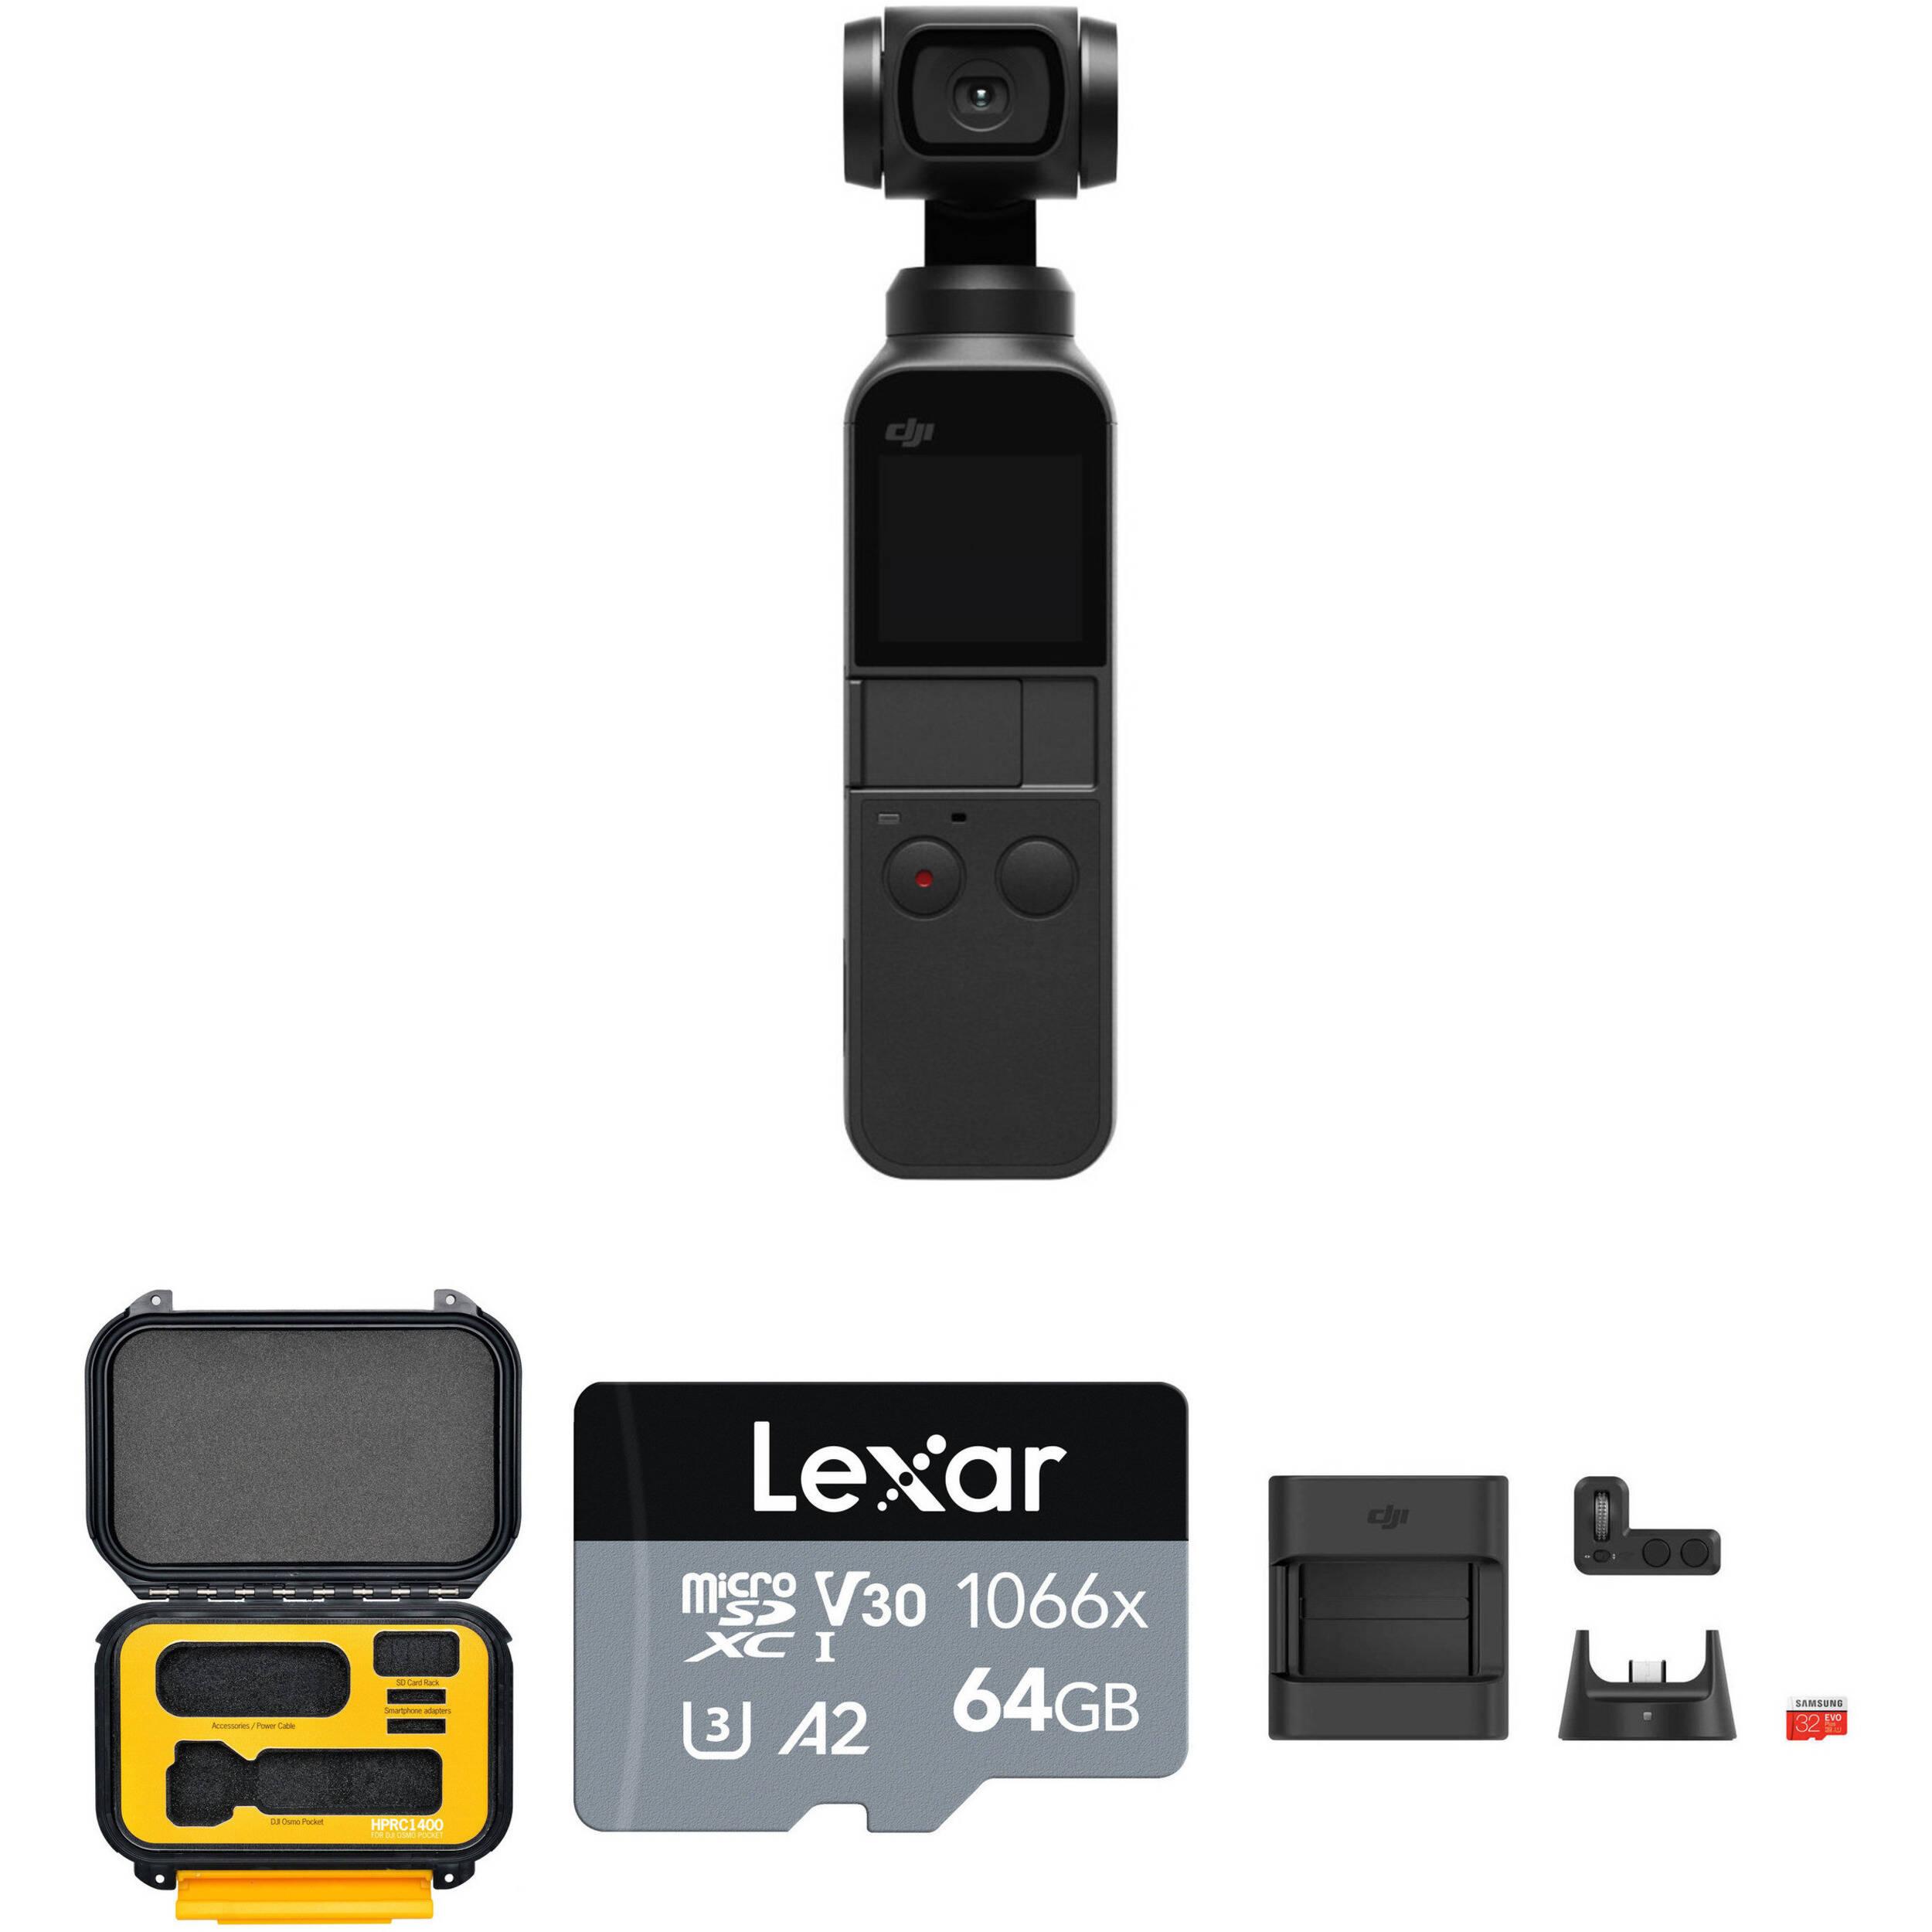 DJI Osmo Pocket Gimbal Kit with HPRC1400 Hard Case B&H Photo